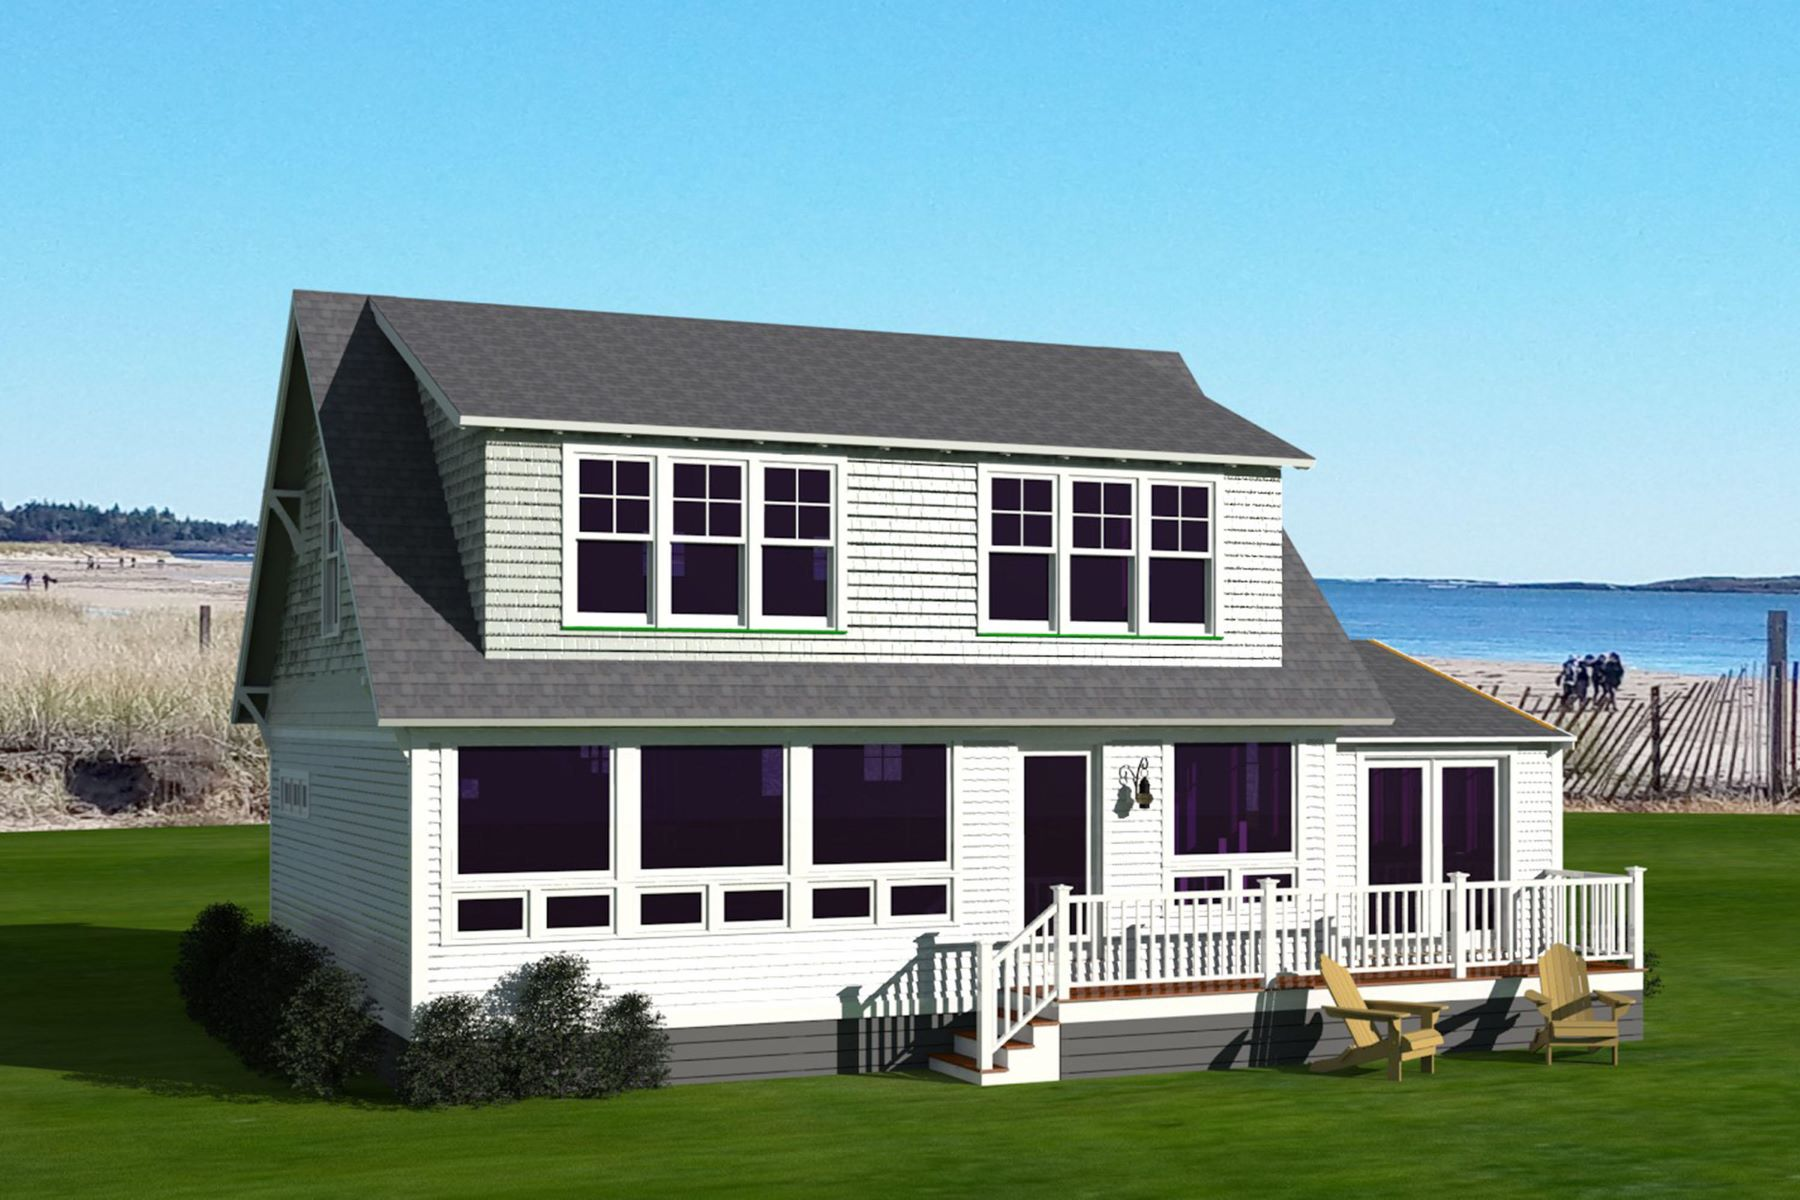 Single Family Homes for Sale at 39 Driftwood Lane 11, Phippsburg, Maine 04562 United States